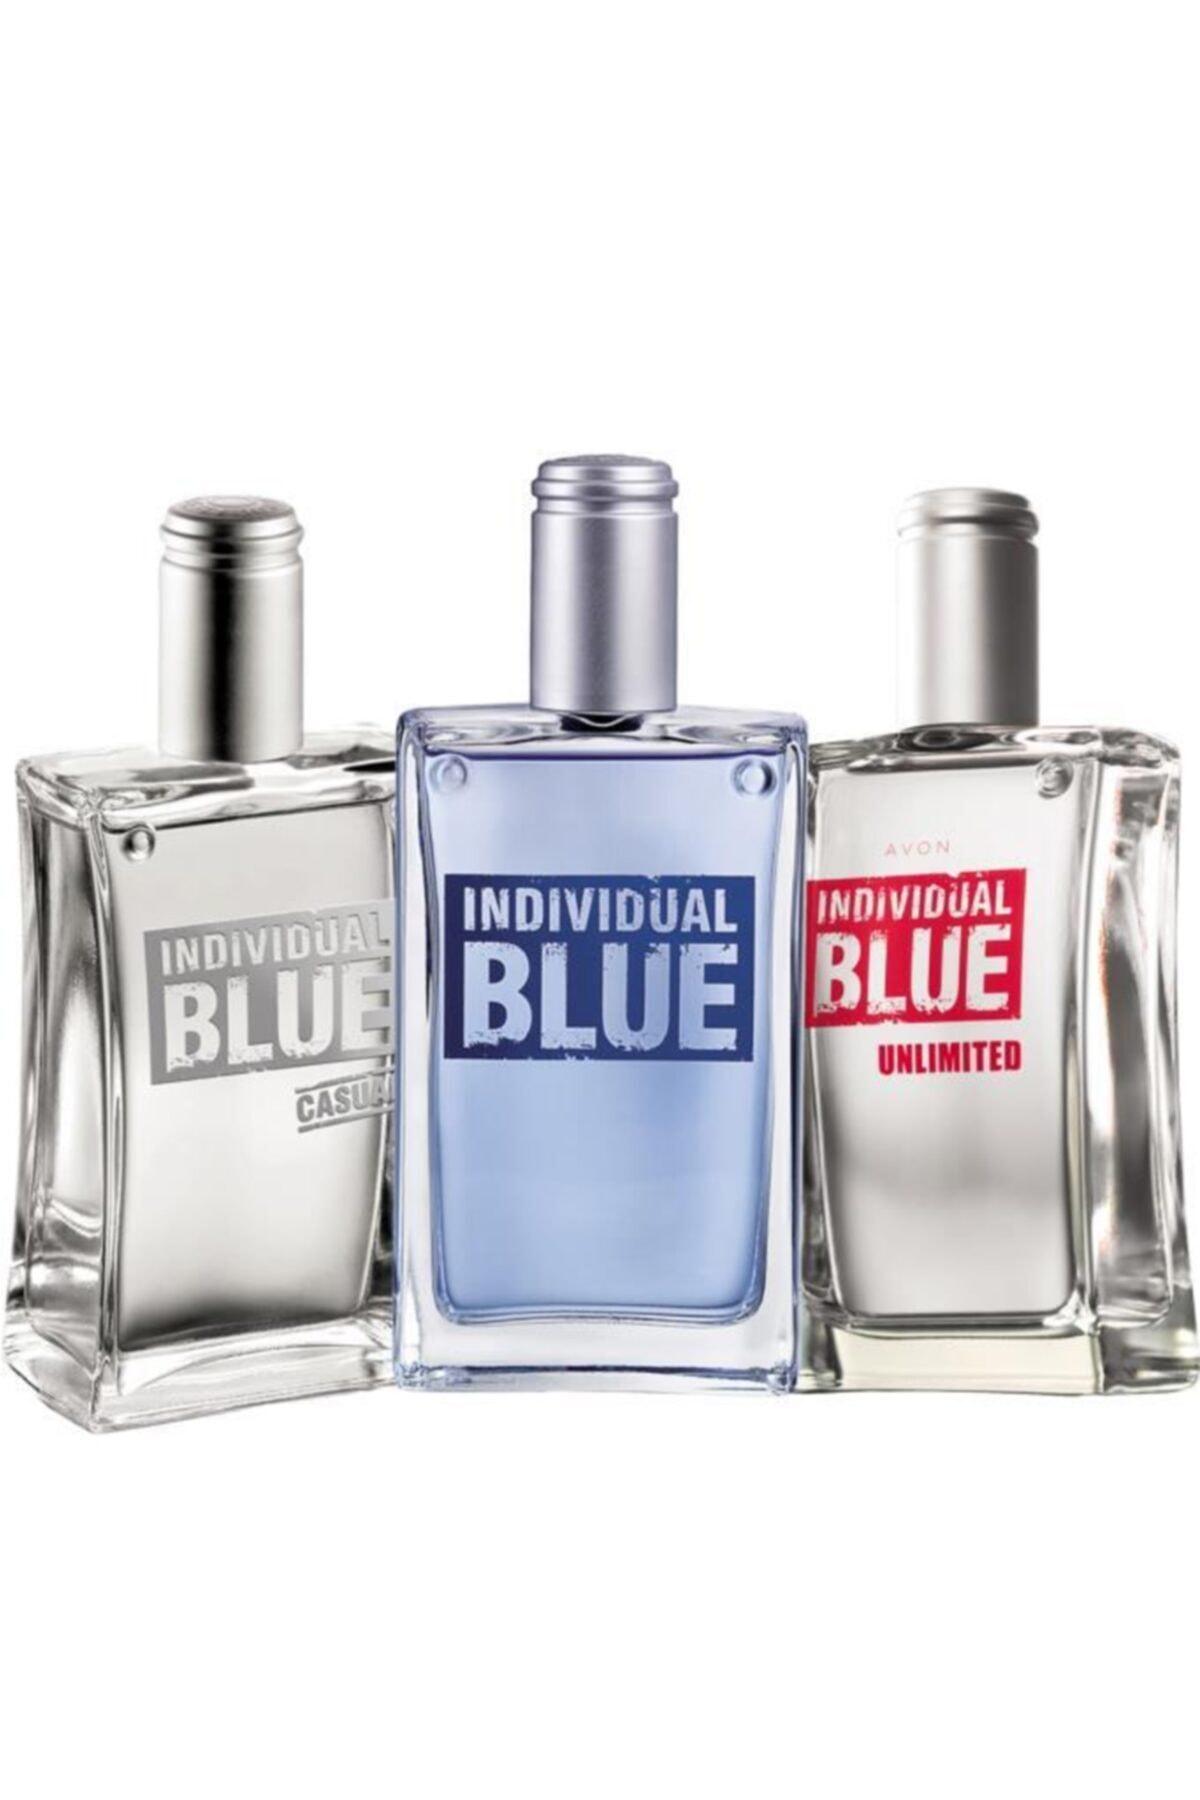 Individual Blue Edt 100 ml Erkek+Individual Blue Unlimited Edt100 ml Erkek Parfüm Set  5050000000550